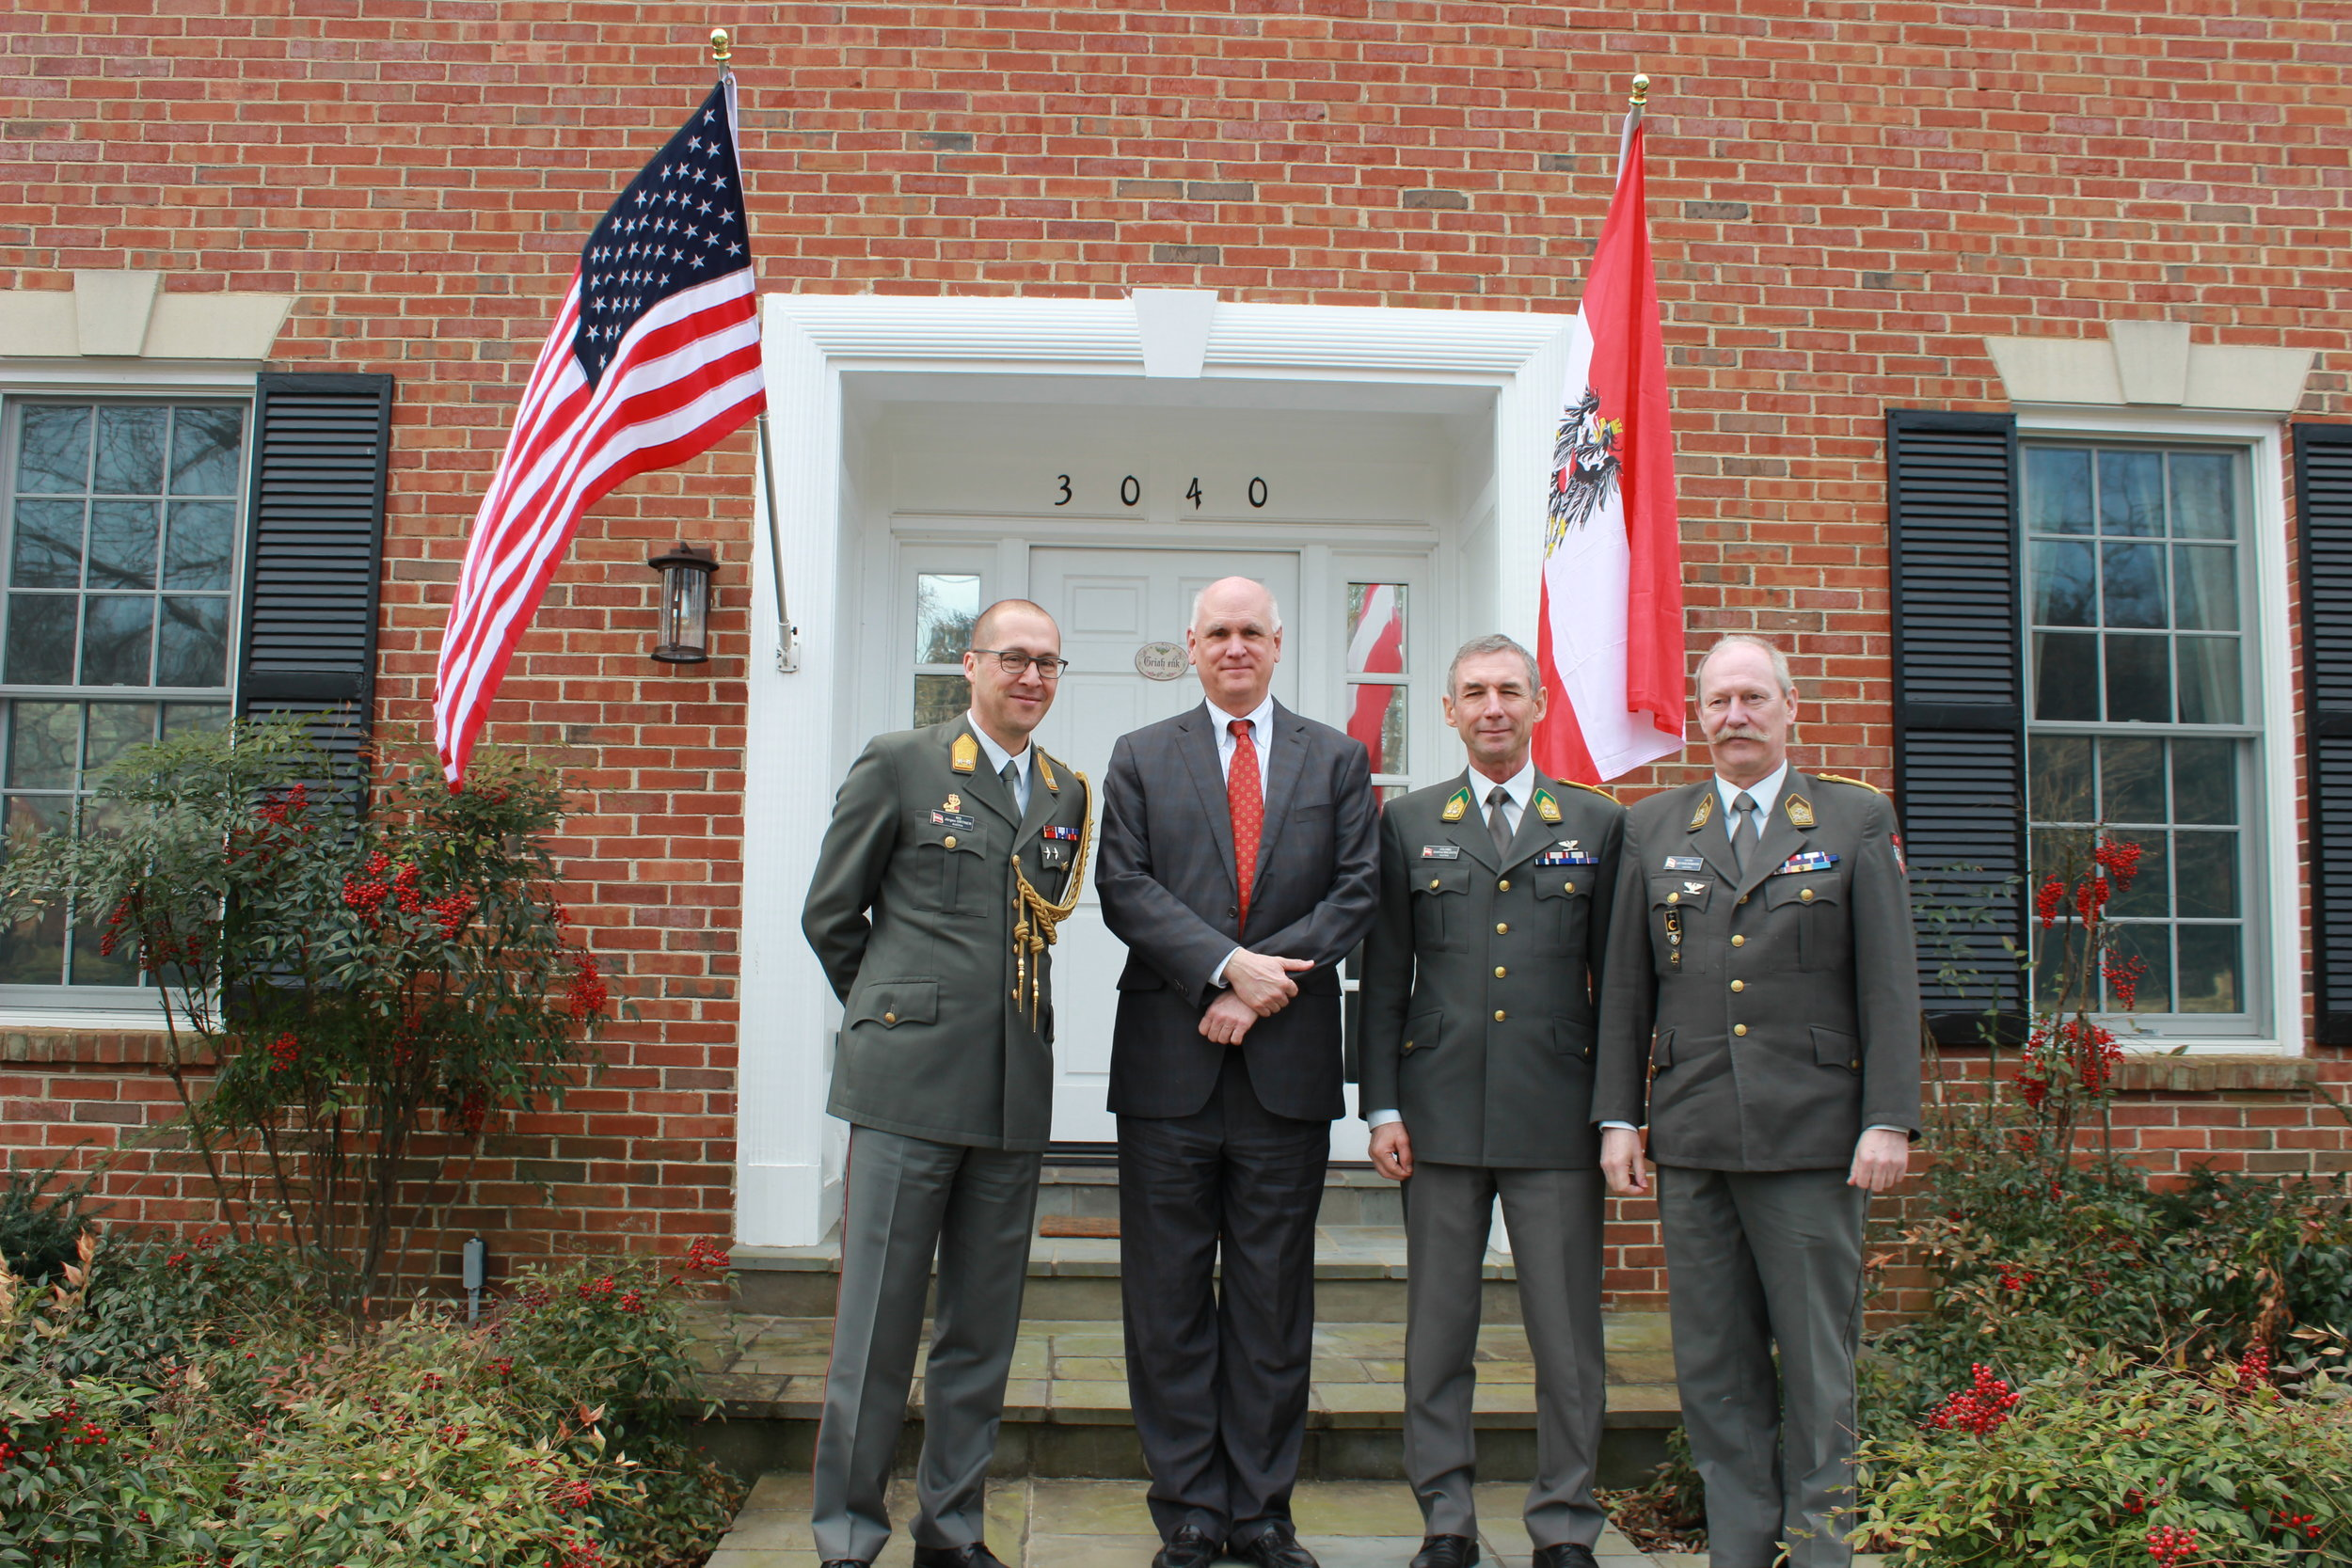 from left: Austrian Defense Attaché, MajGen Jürgen Ortner, former U.S. Deputy Assistant Secretary of Defense, Jim Townsend, Austrian Colonel Gottfried Malovits, Austrian Colonel Leo Radlingmayer